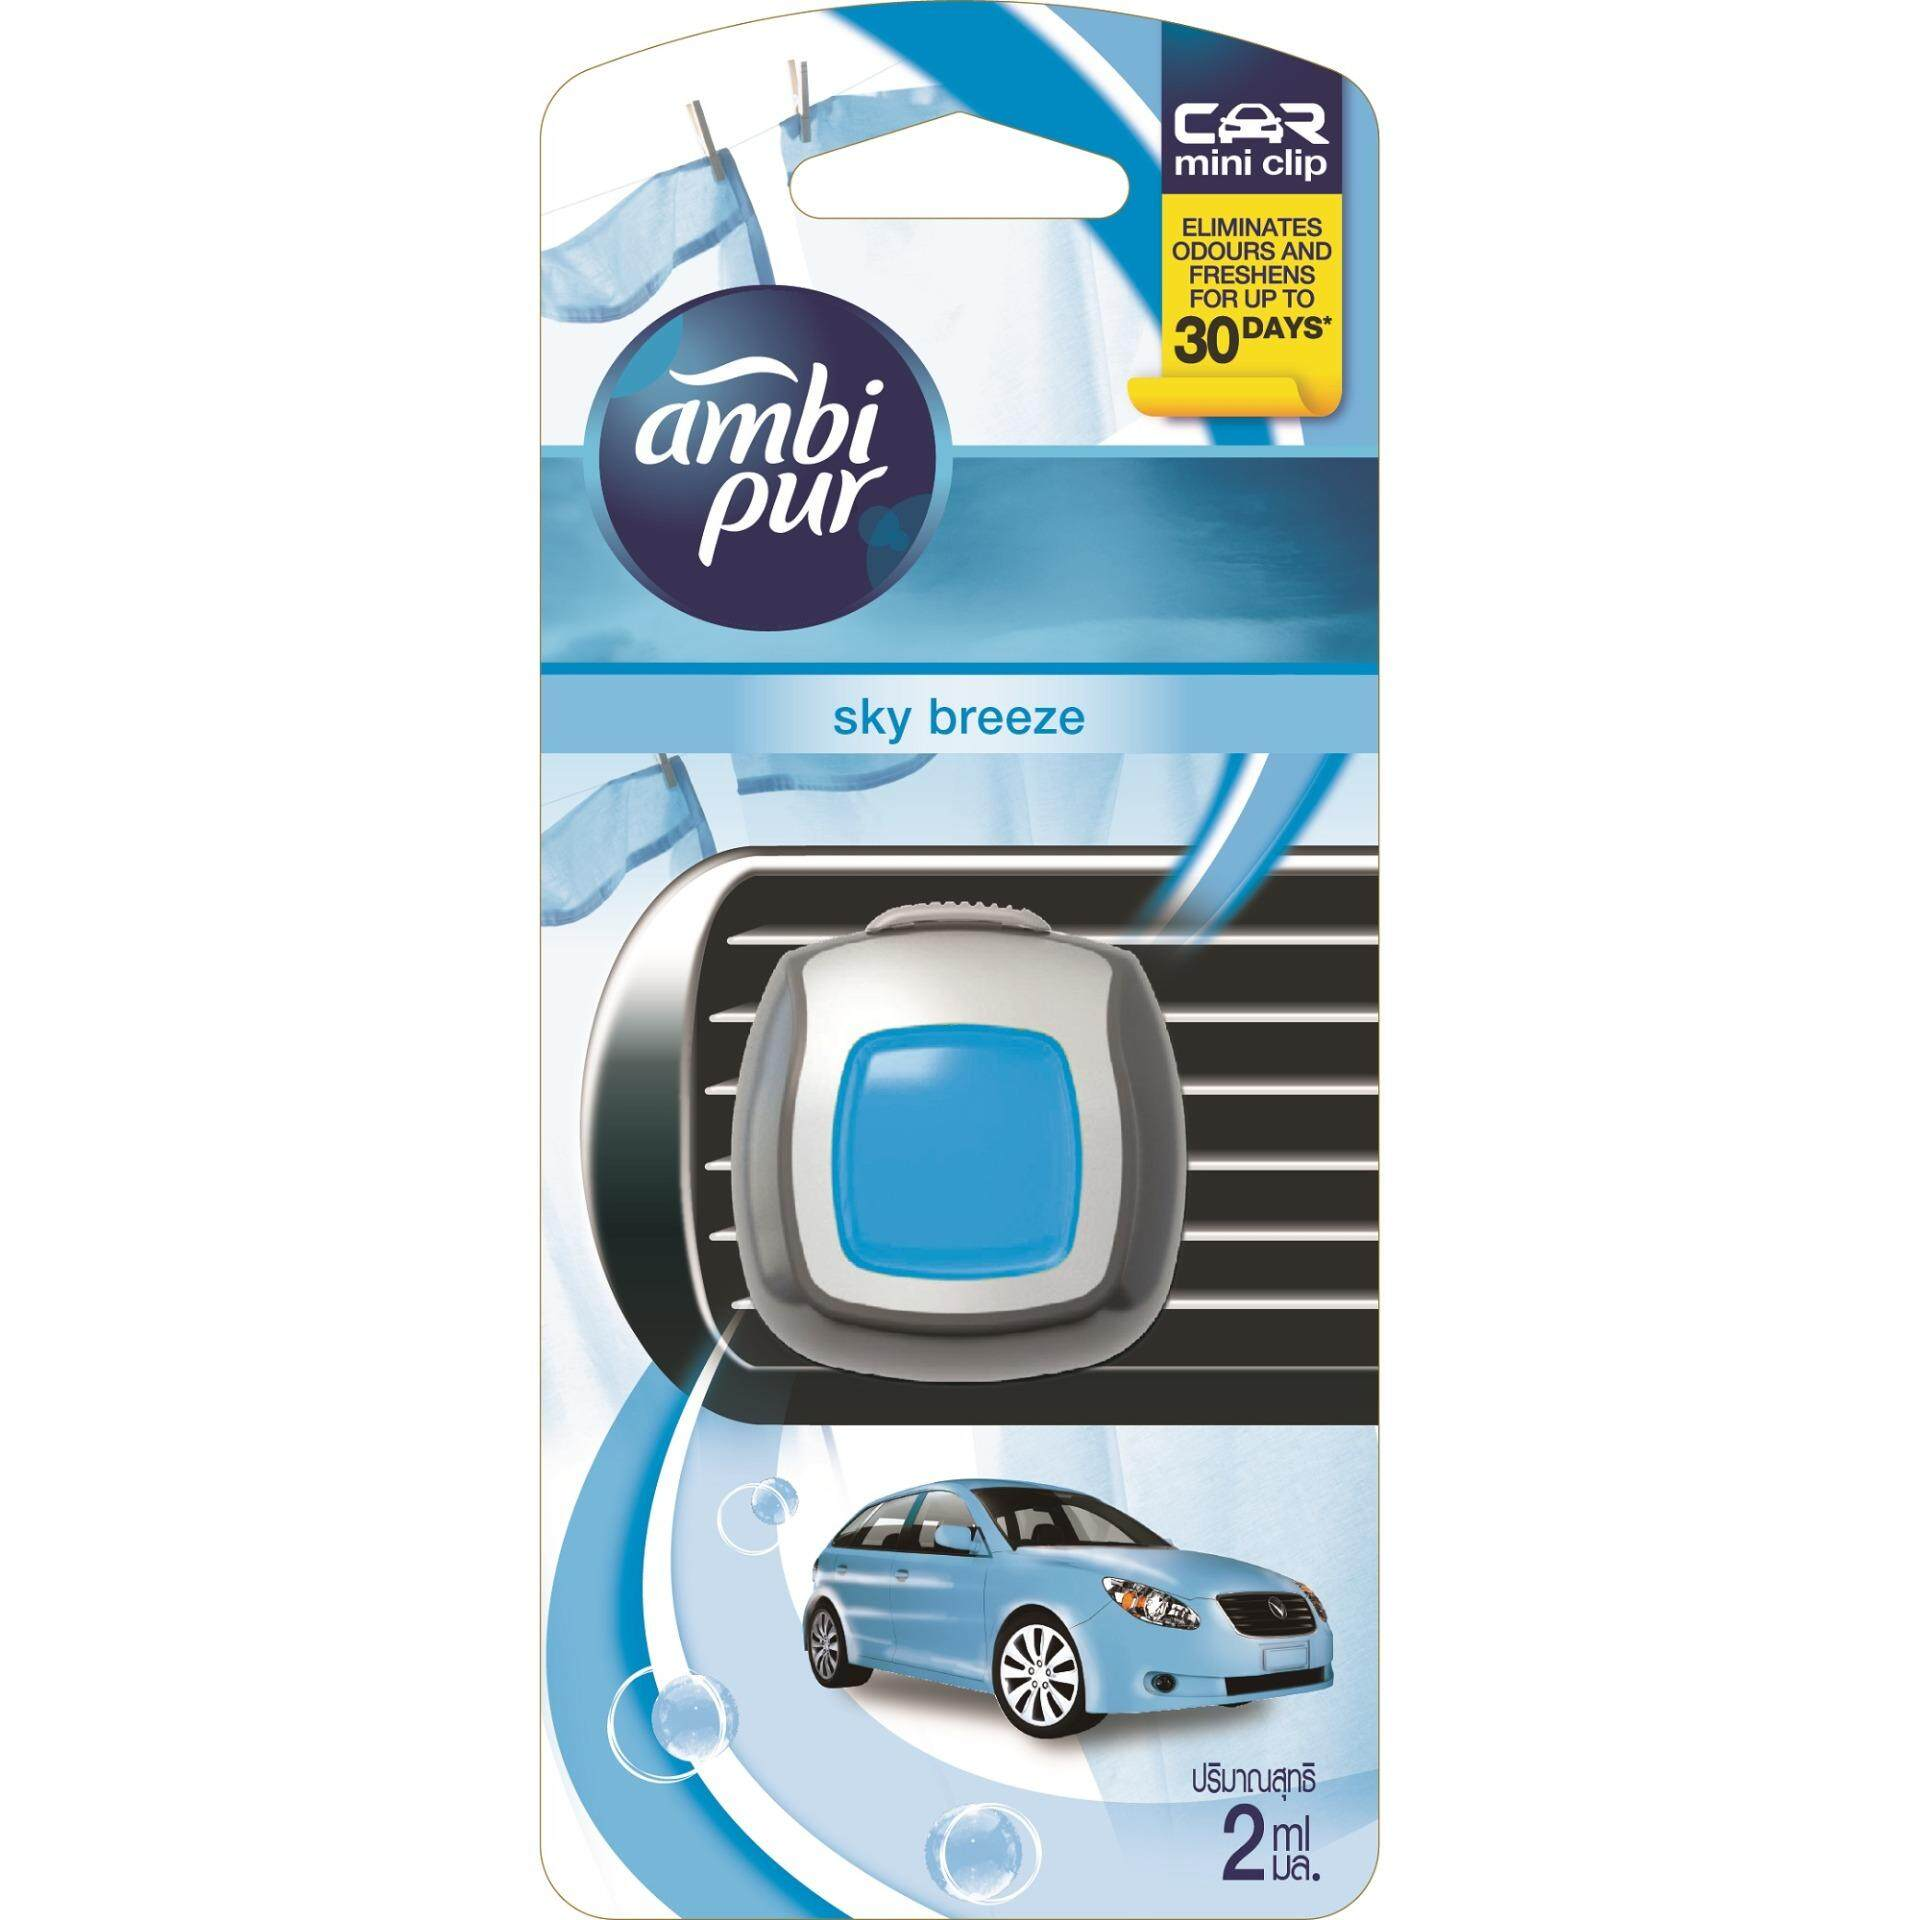 Ambi Pur Mini Clip Car Air Freshener Sky Breeze 2ML